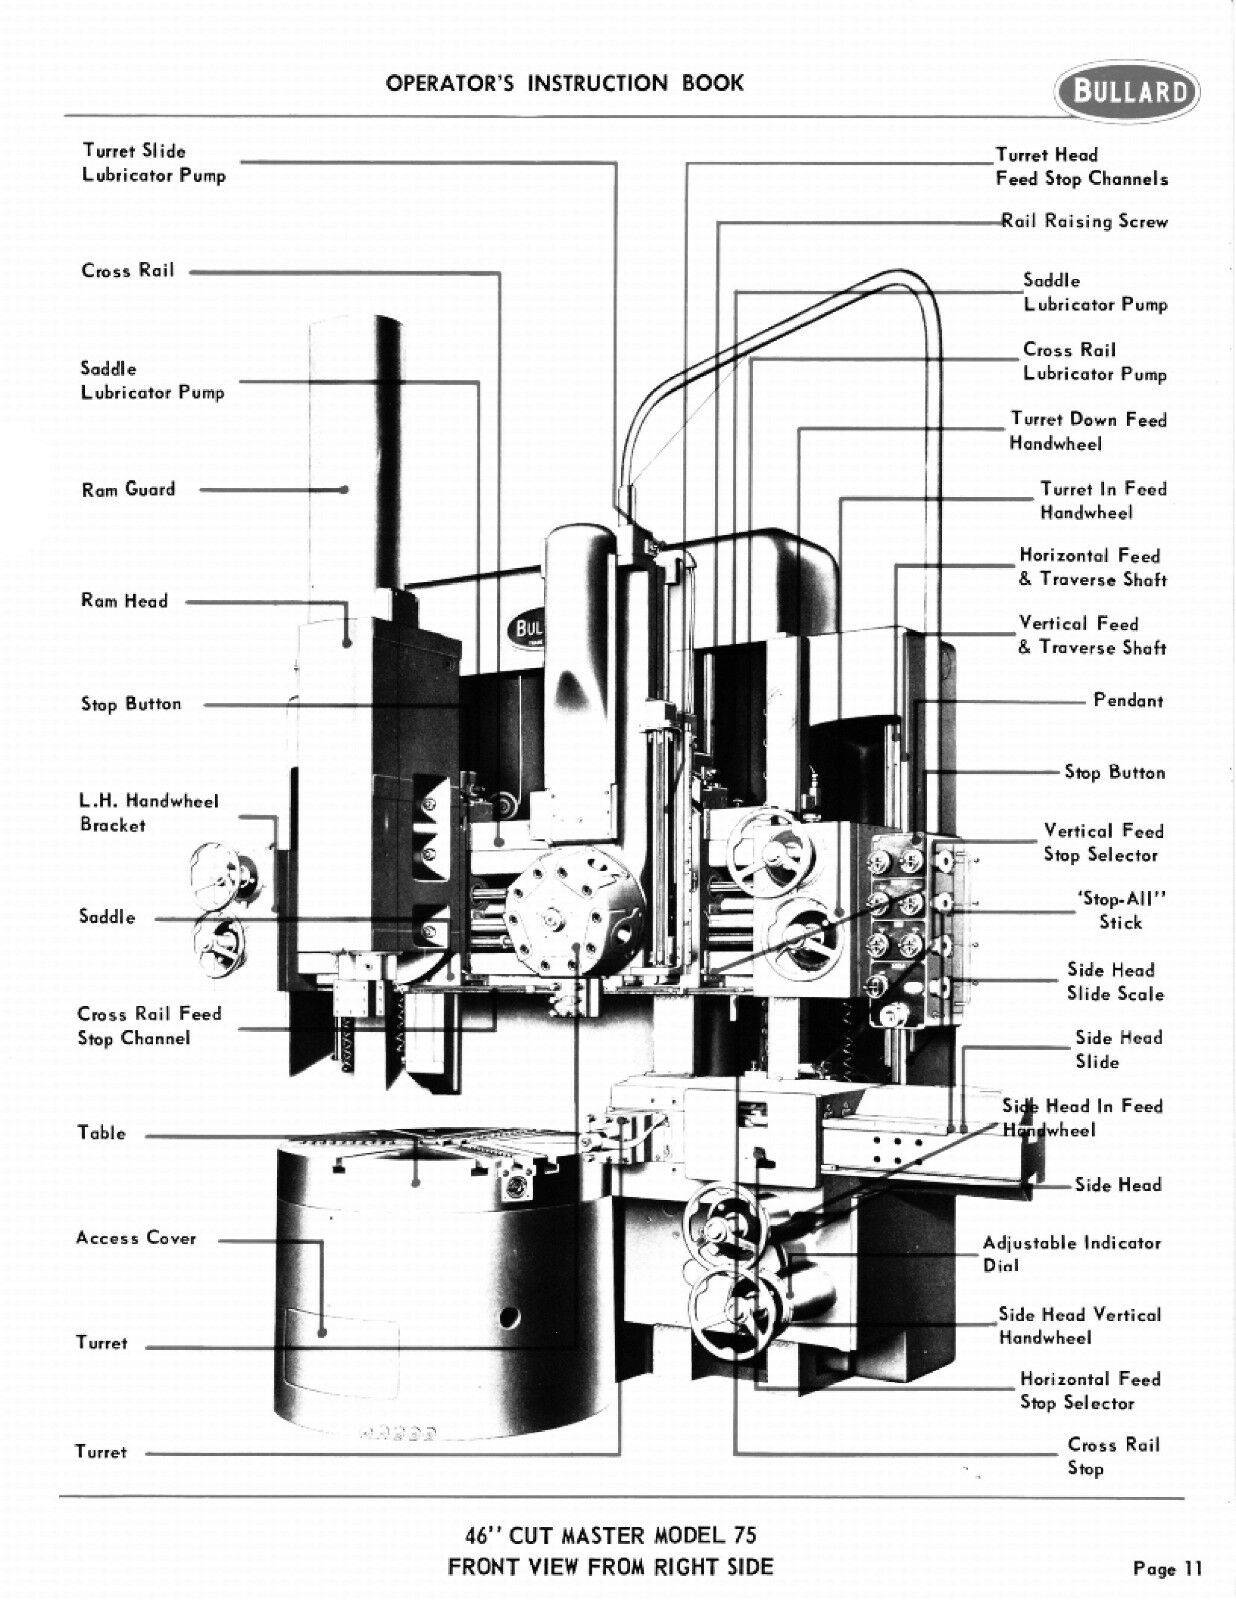 Bullard Cutmaster 75 Vertical Turret Lathe Operators Instruction Manual  *390